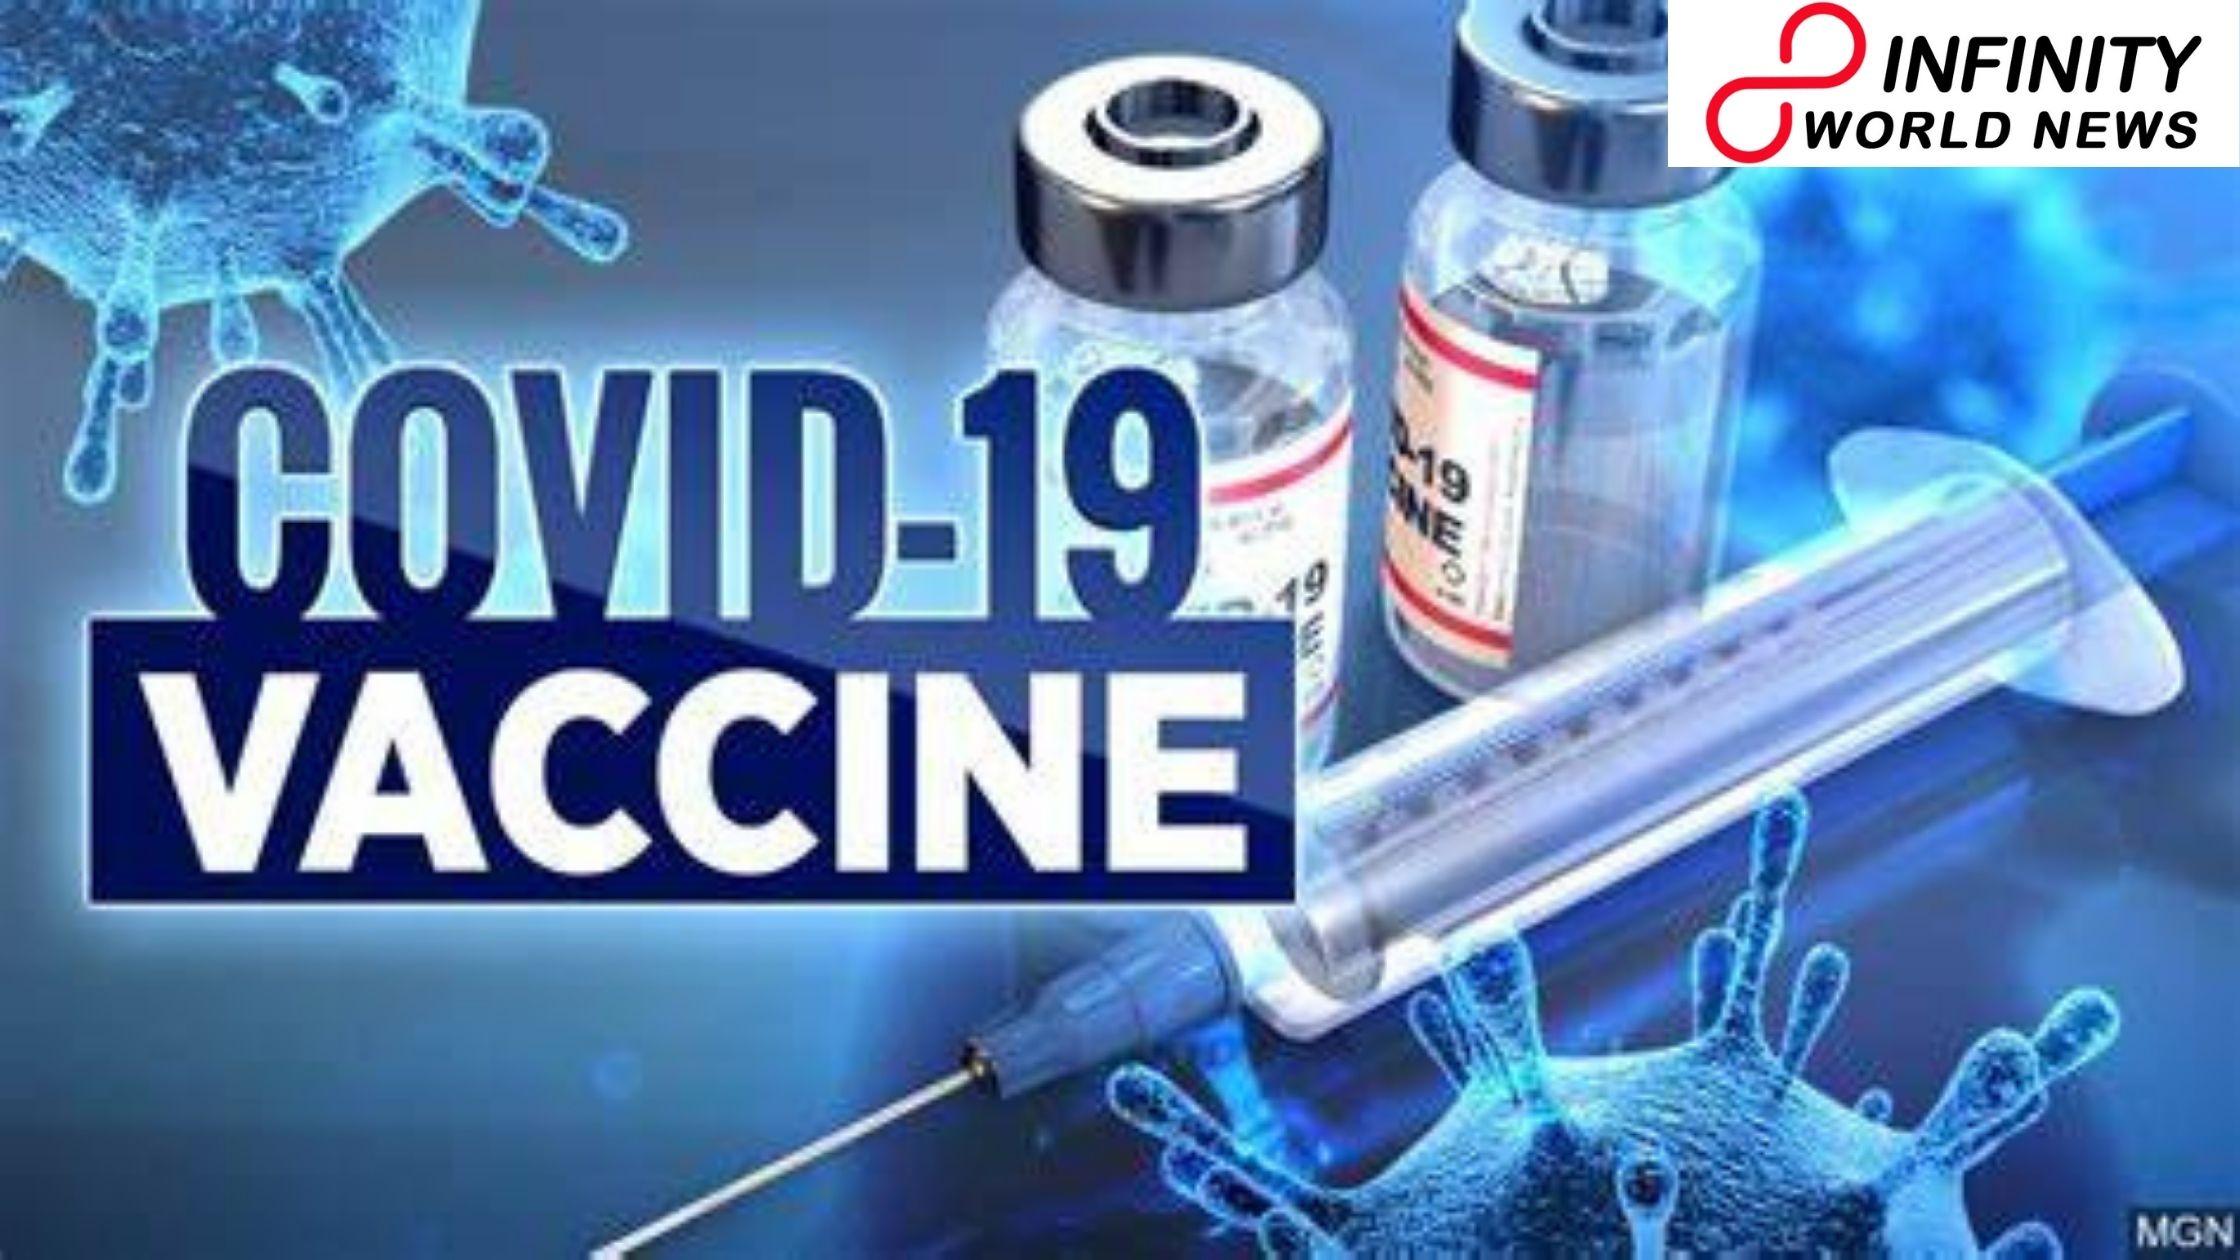 Aadhaar, SMS, DigiLocker: New Aspects On Covid Vaccination